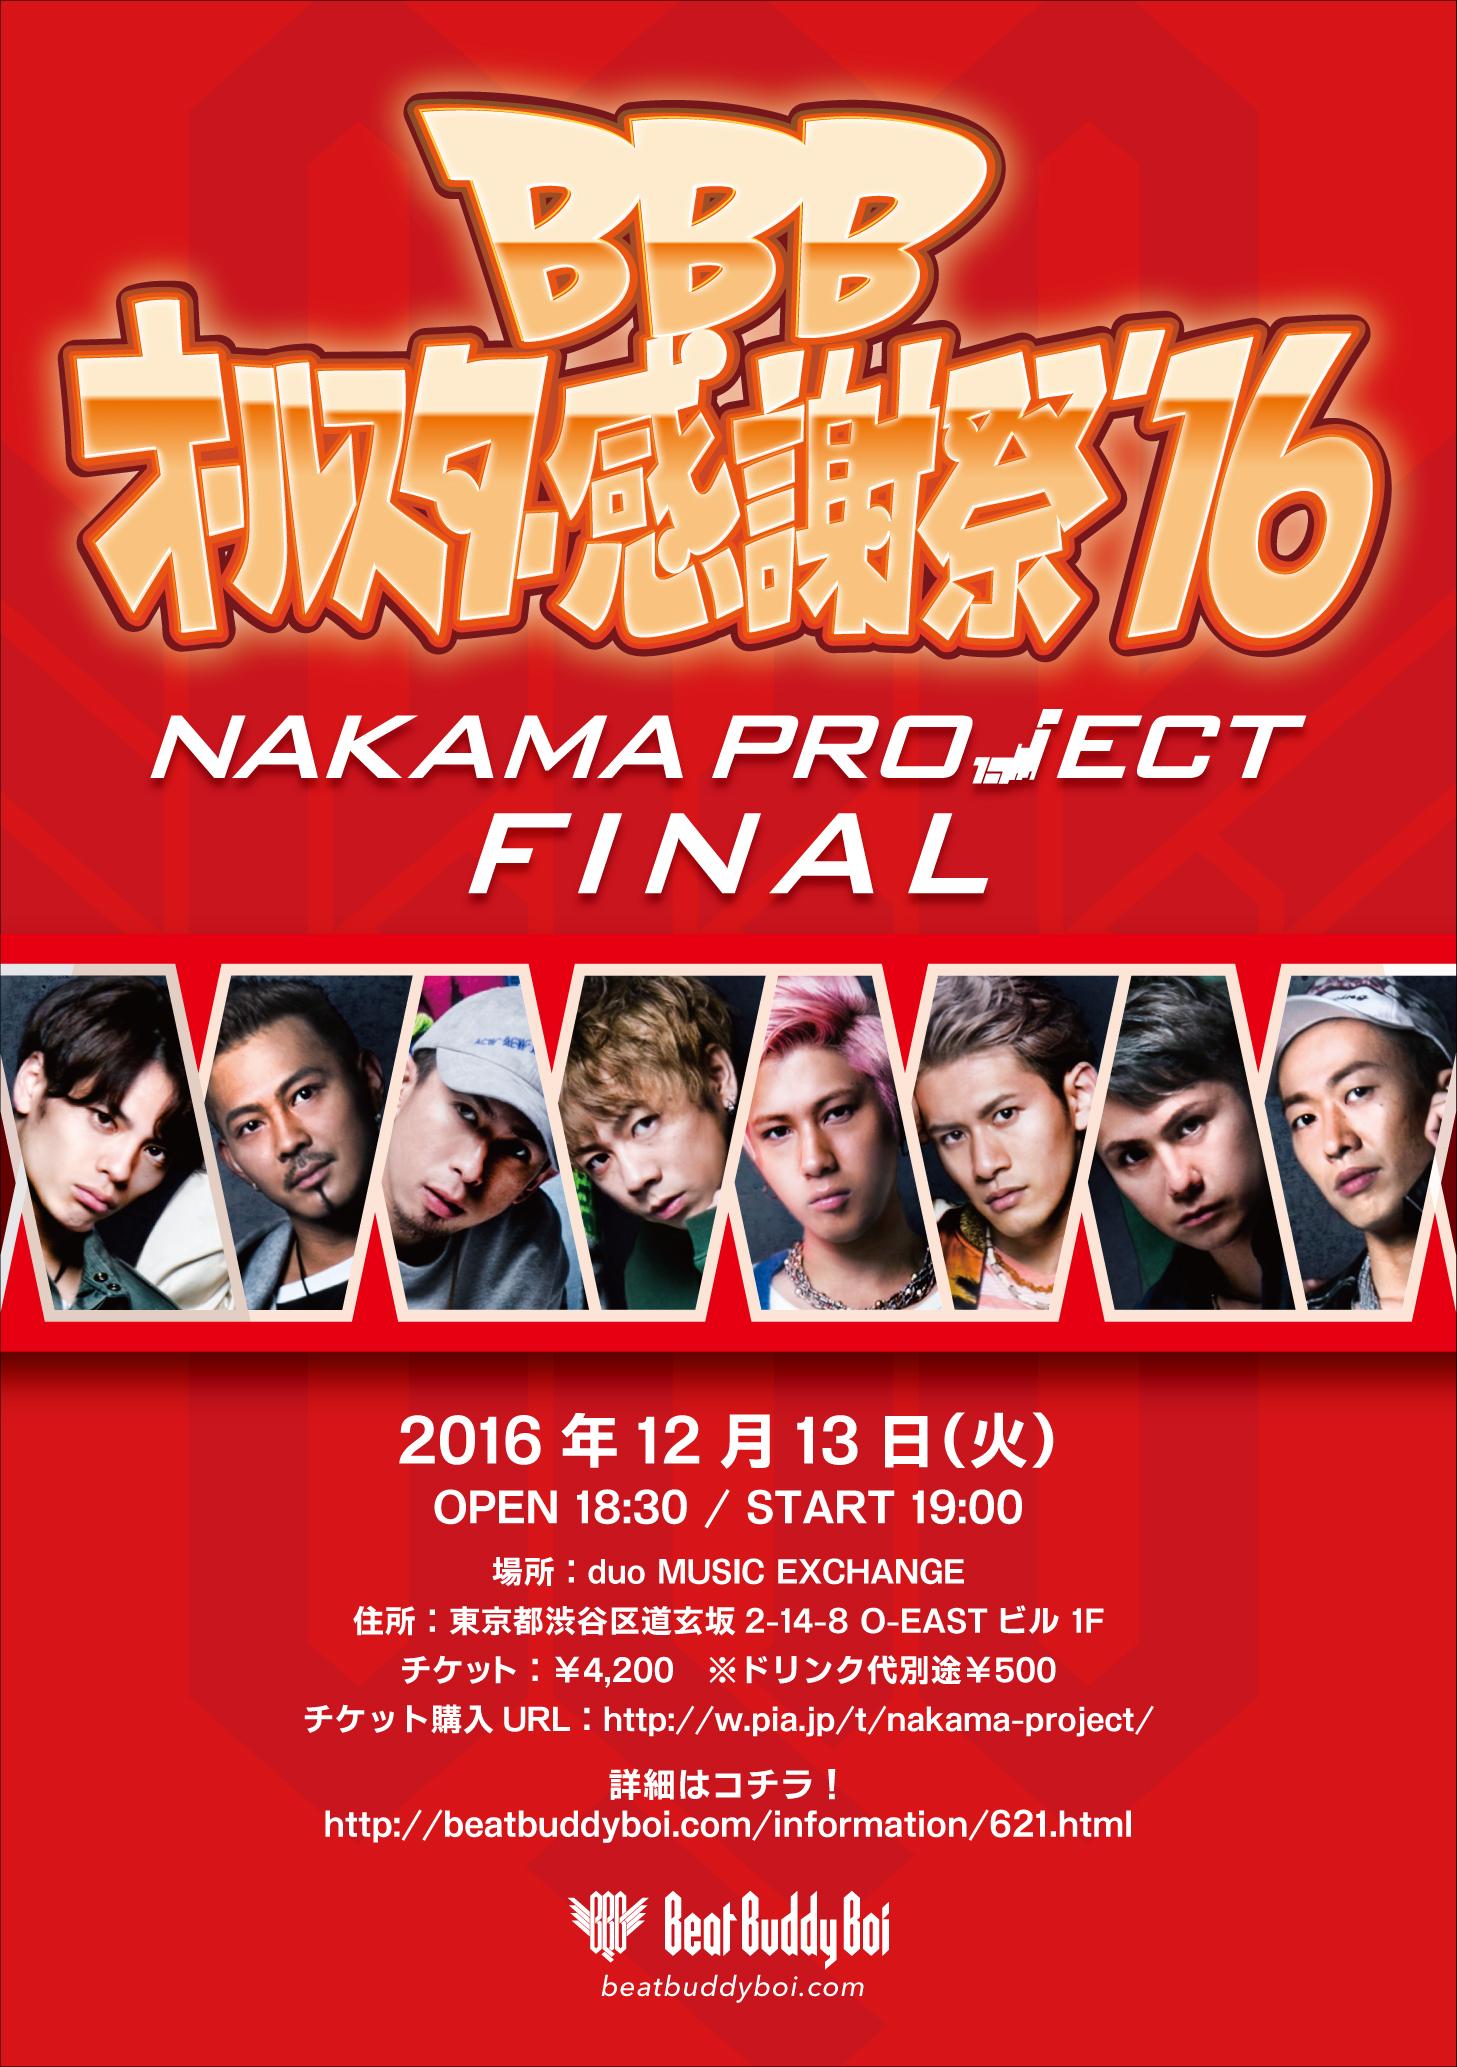 『BBBオールスター感謝祭'16~NAKAMA PROJECT FINAL~』4大情報まとめ!!